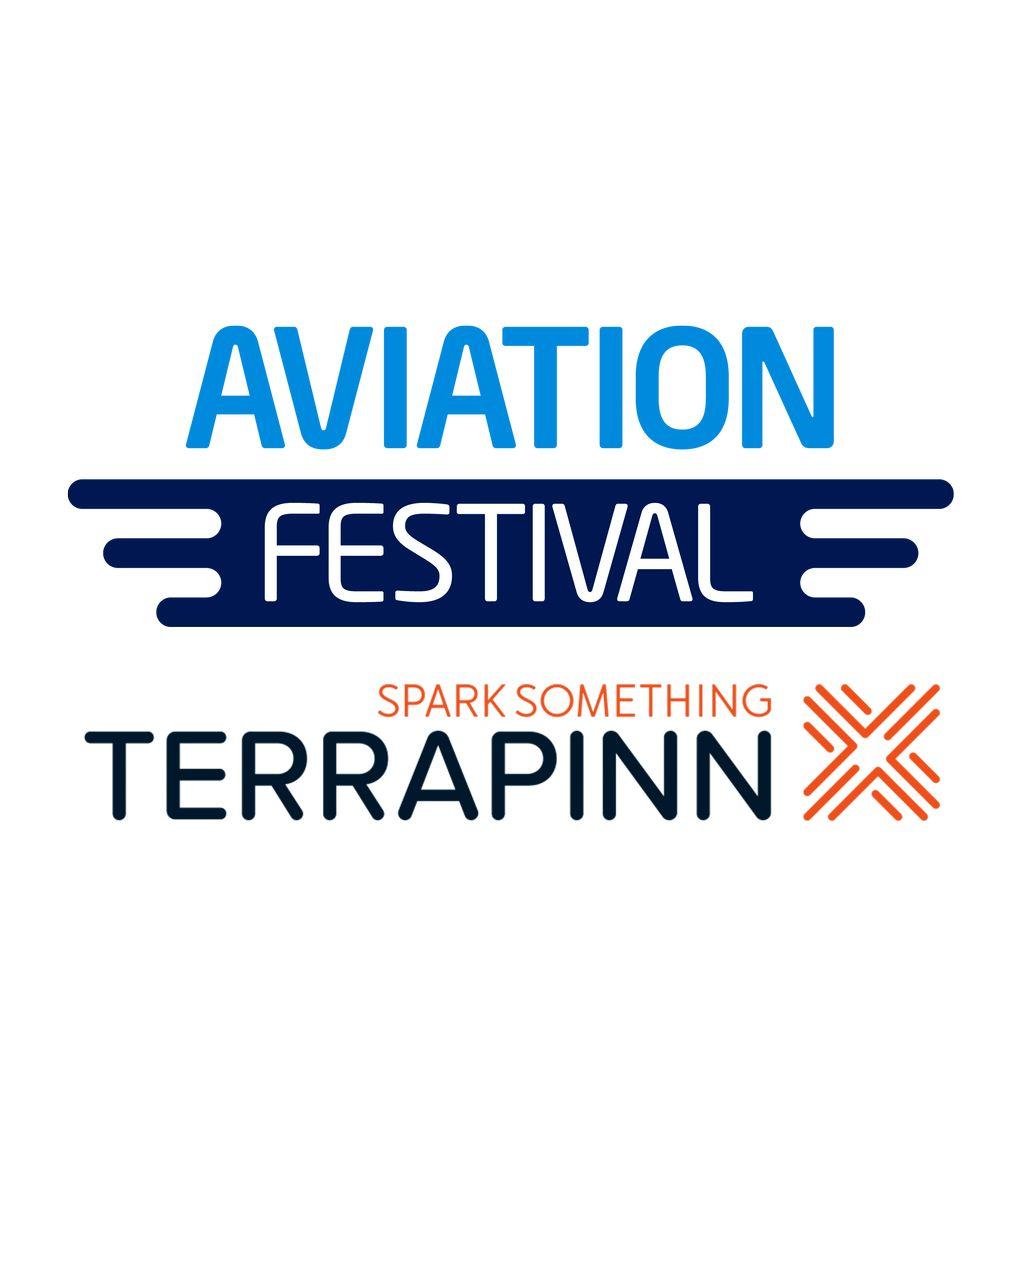 AVIATION FESTIVAL AMERICAS 2019 CONFERENCE